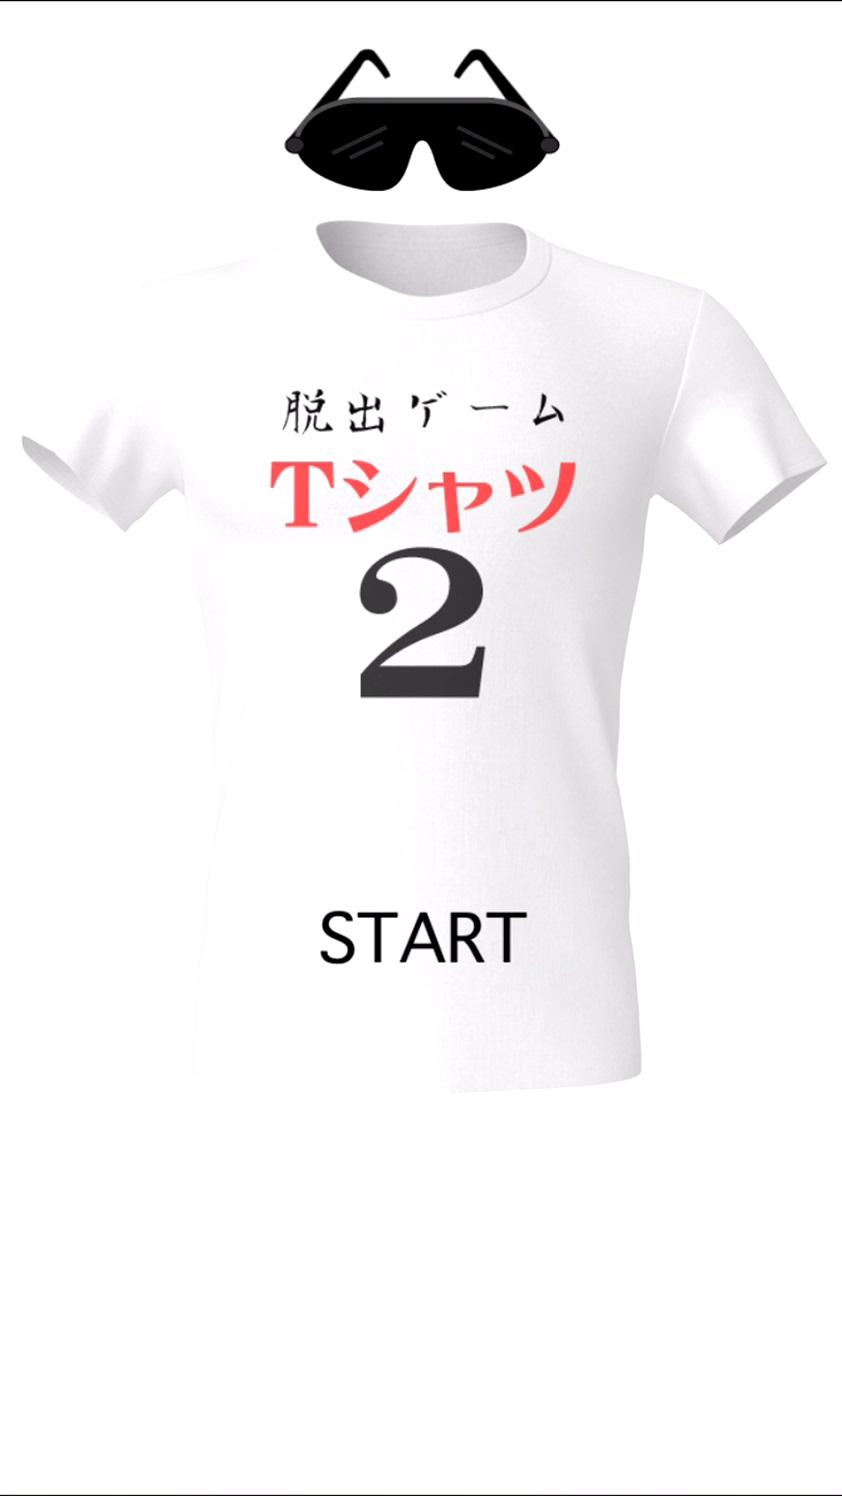 androidアプリ 脱出ゲーム Tシャツ2攻略スクリーンショット1